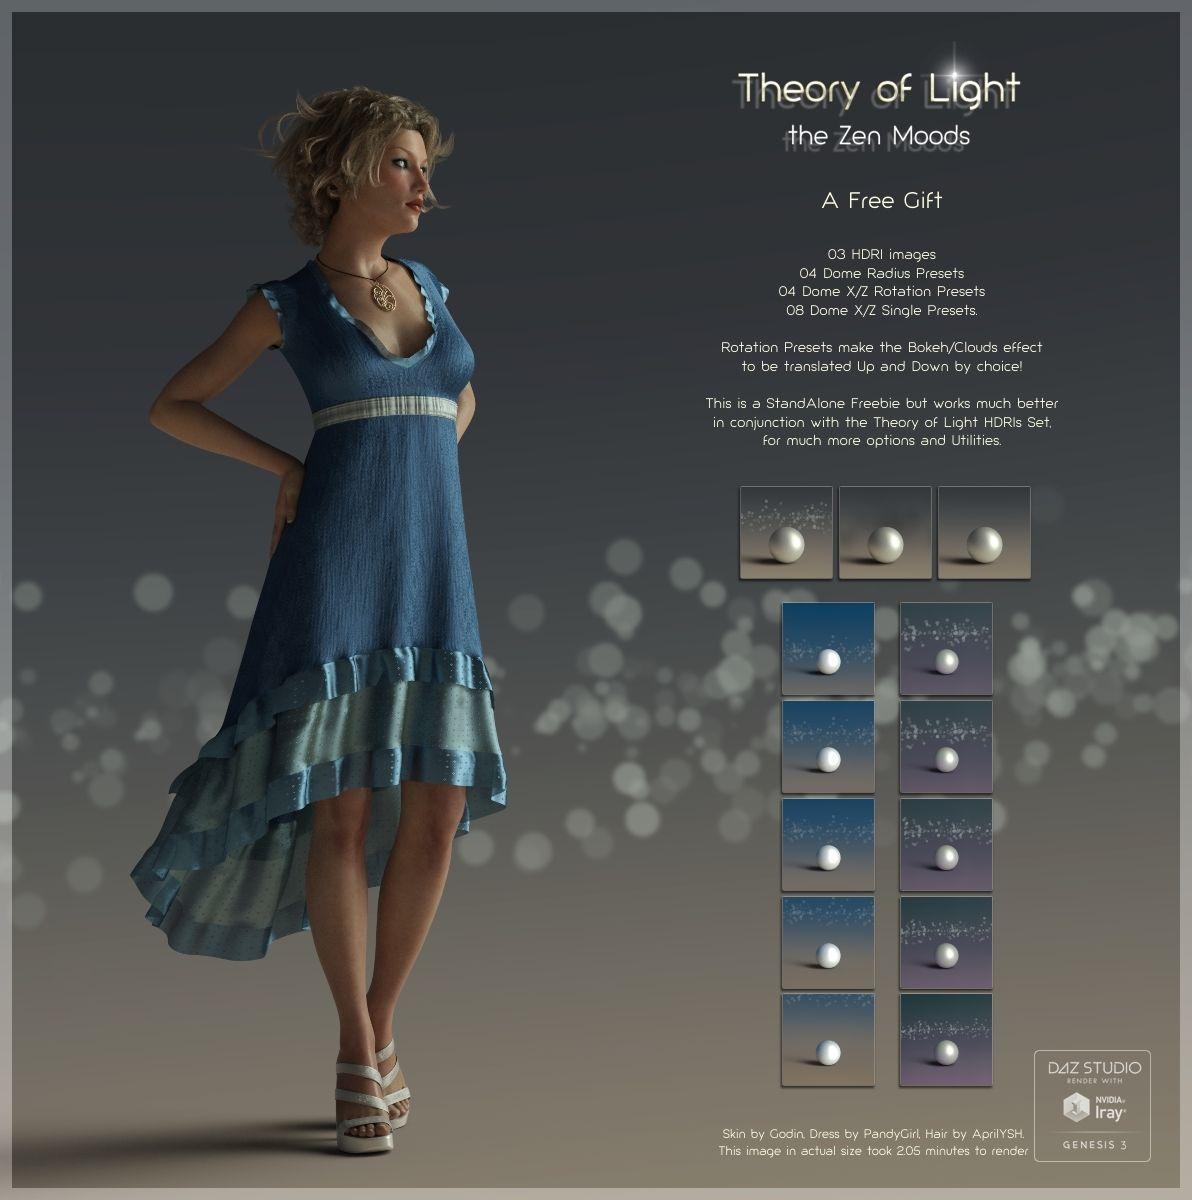 FREE HDRI images and Presets for Iray lighting, Daz Studio